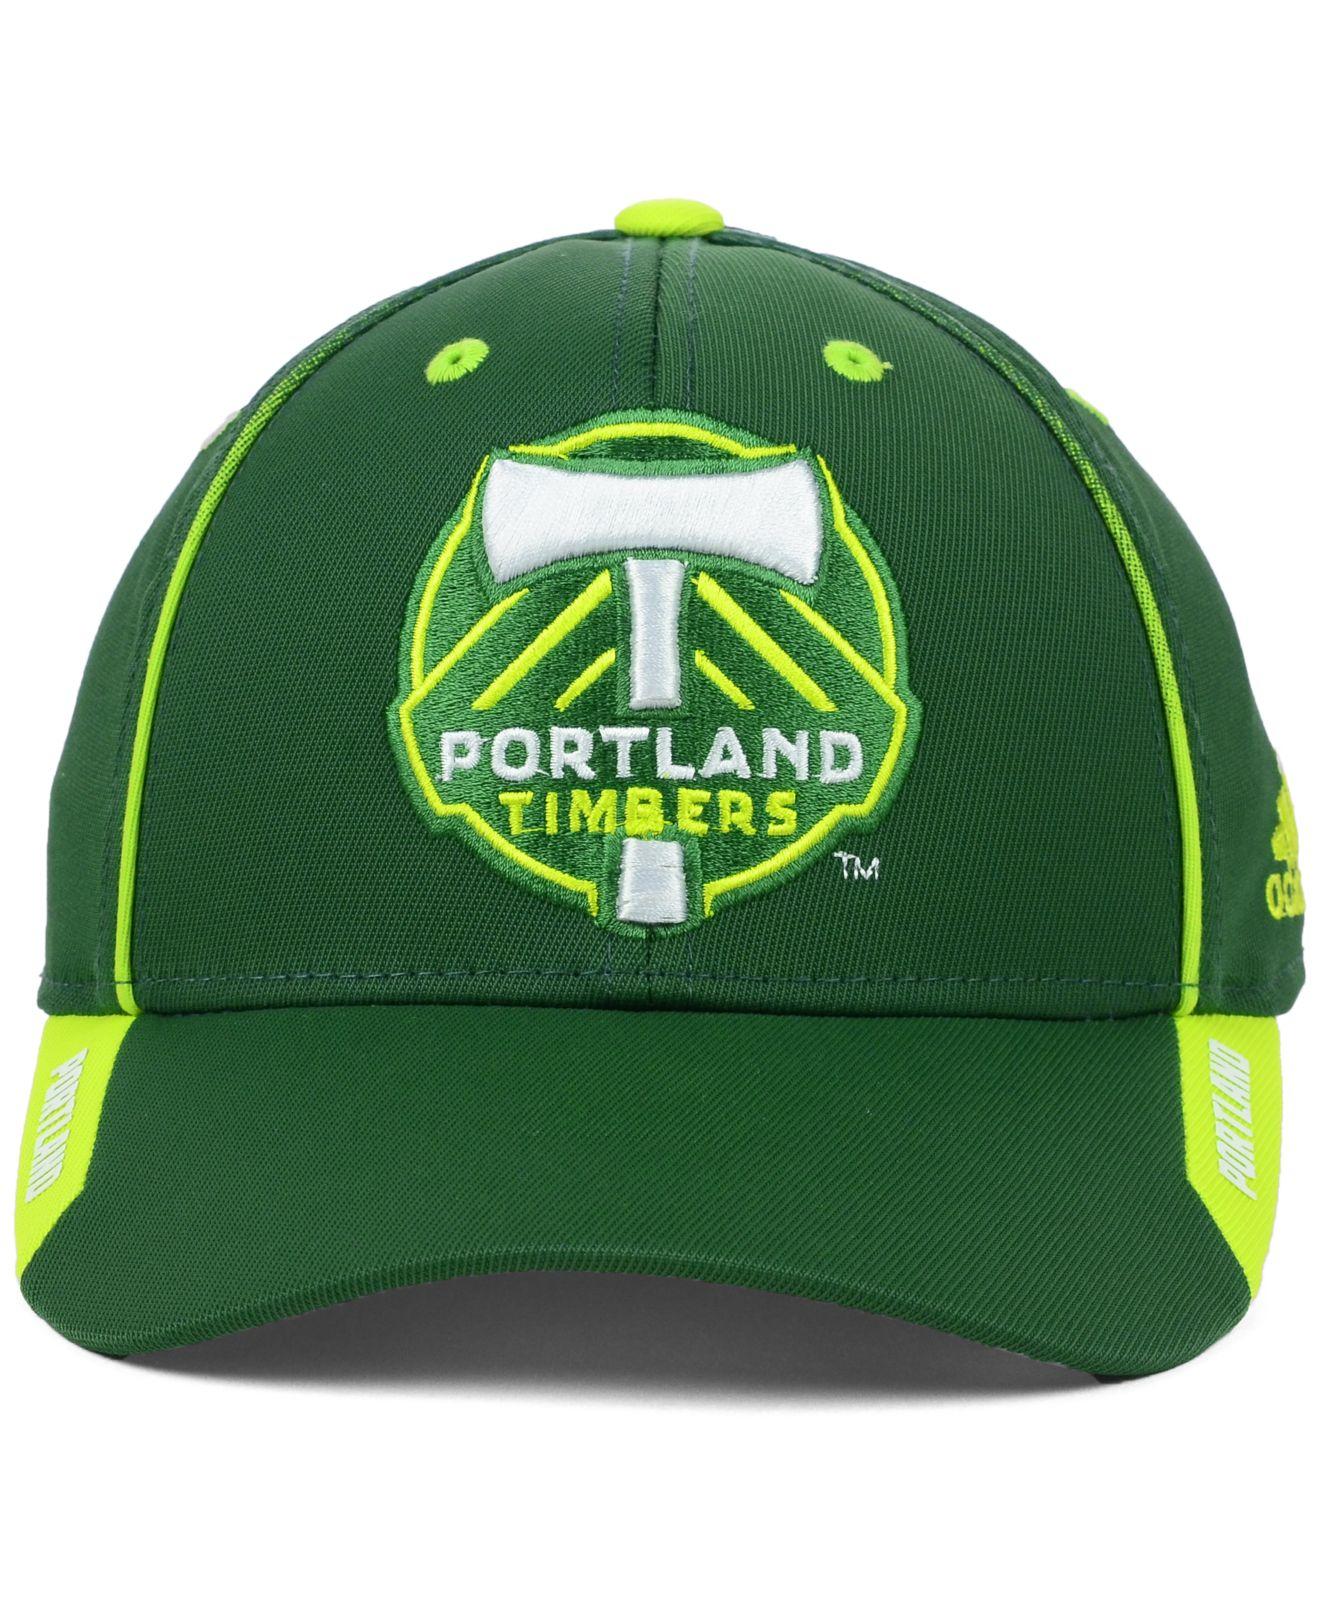 3ade41a3c14 ... denmark lyst adidas portland timbers mls mid fielder cap in green for  men 581ea 480a3